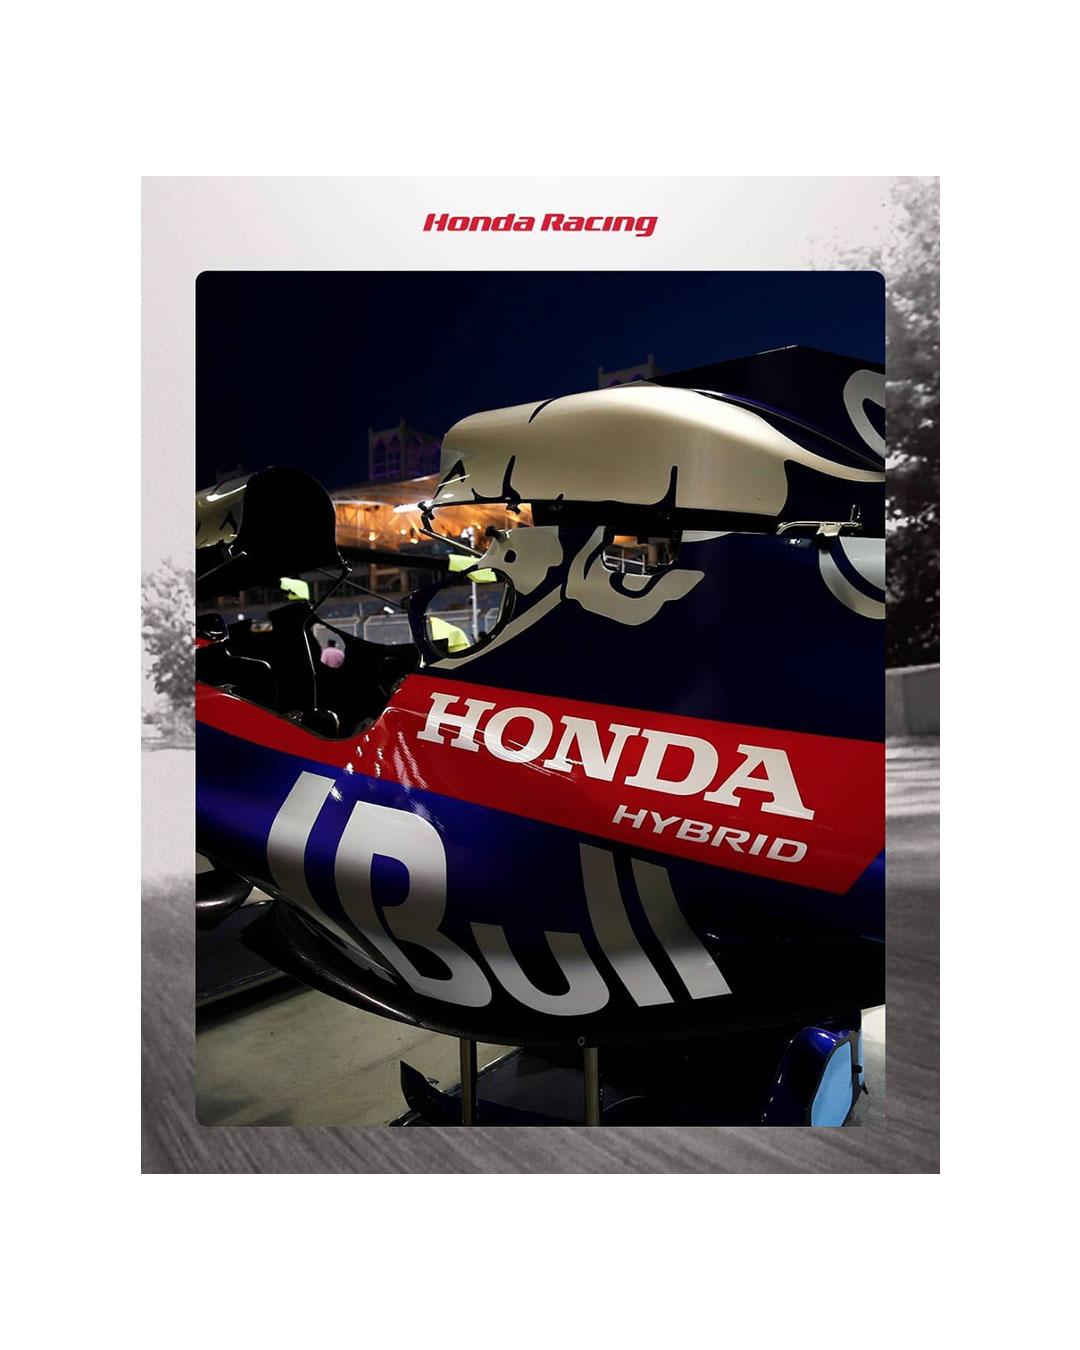 ary-and-joe-honda-formula-1-poster-2.jpg